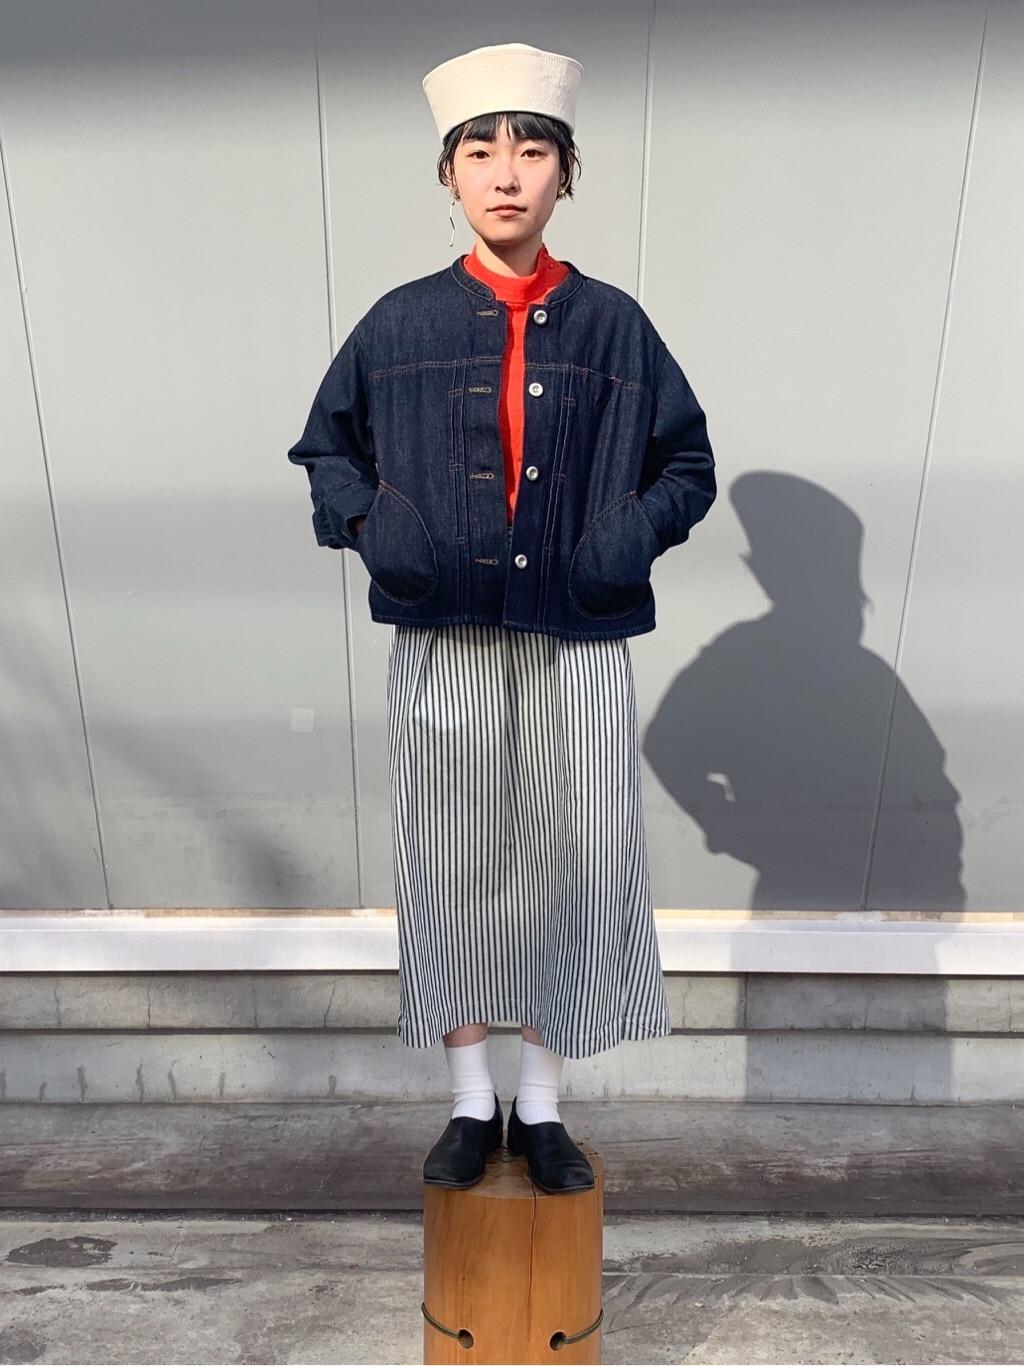 bulle de savon 新宿ミロード 身長:159cm 2020.02.22